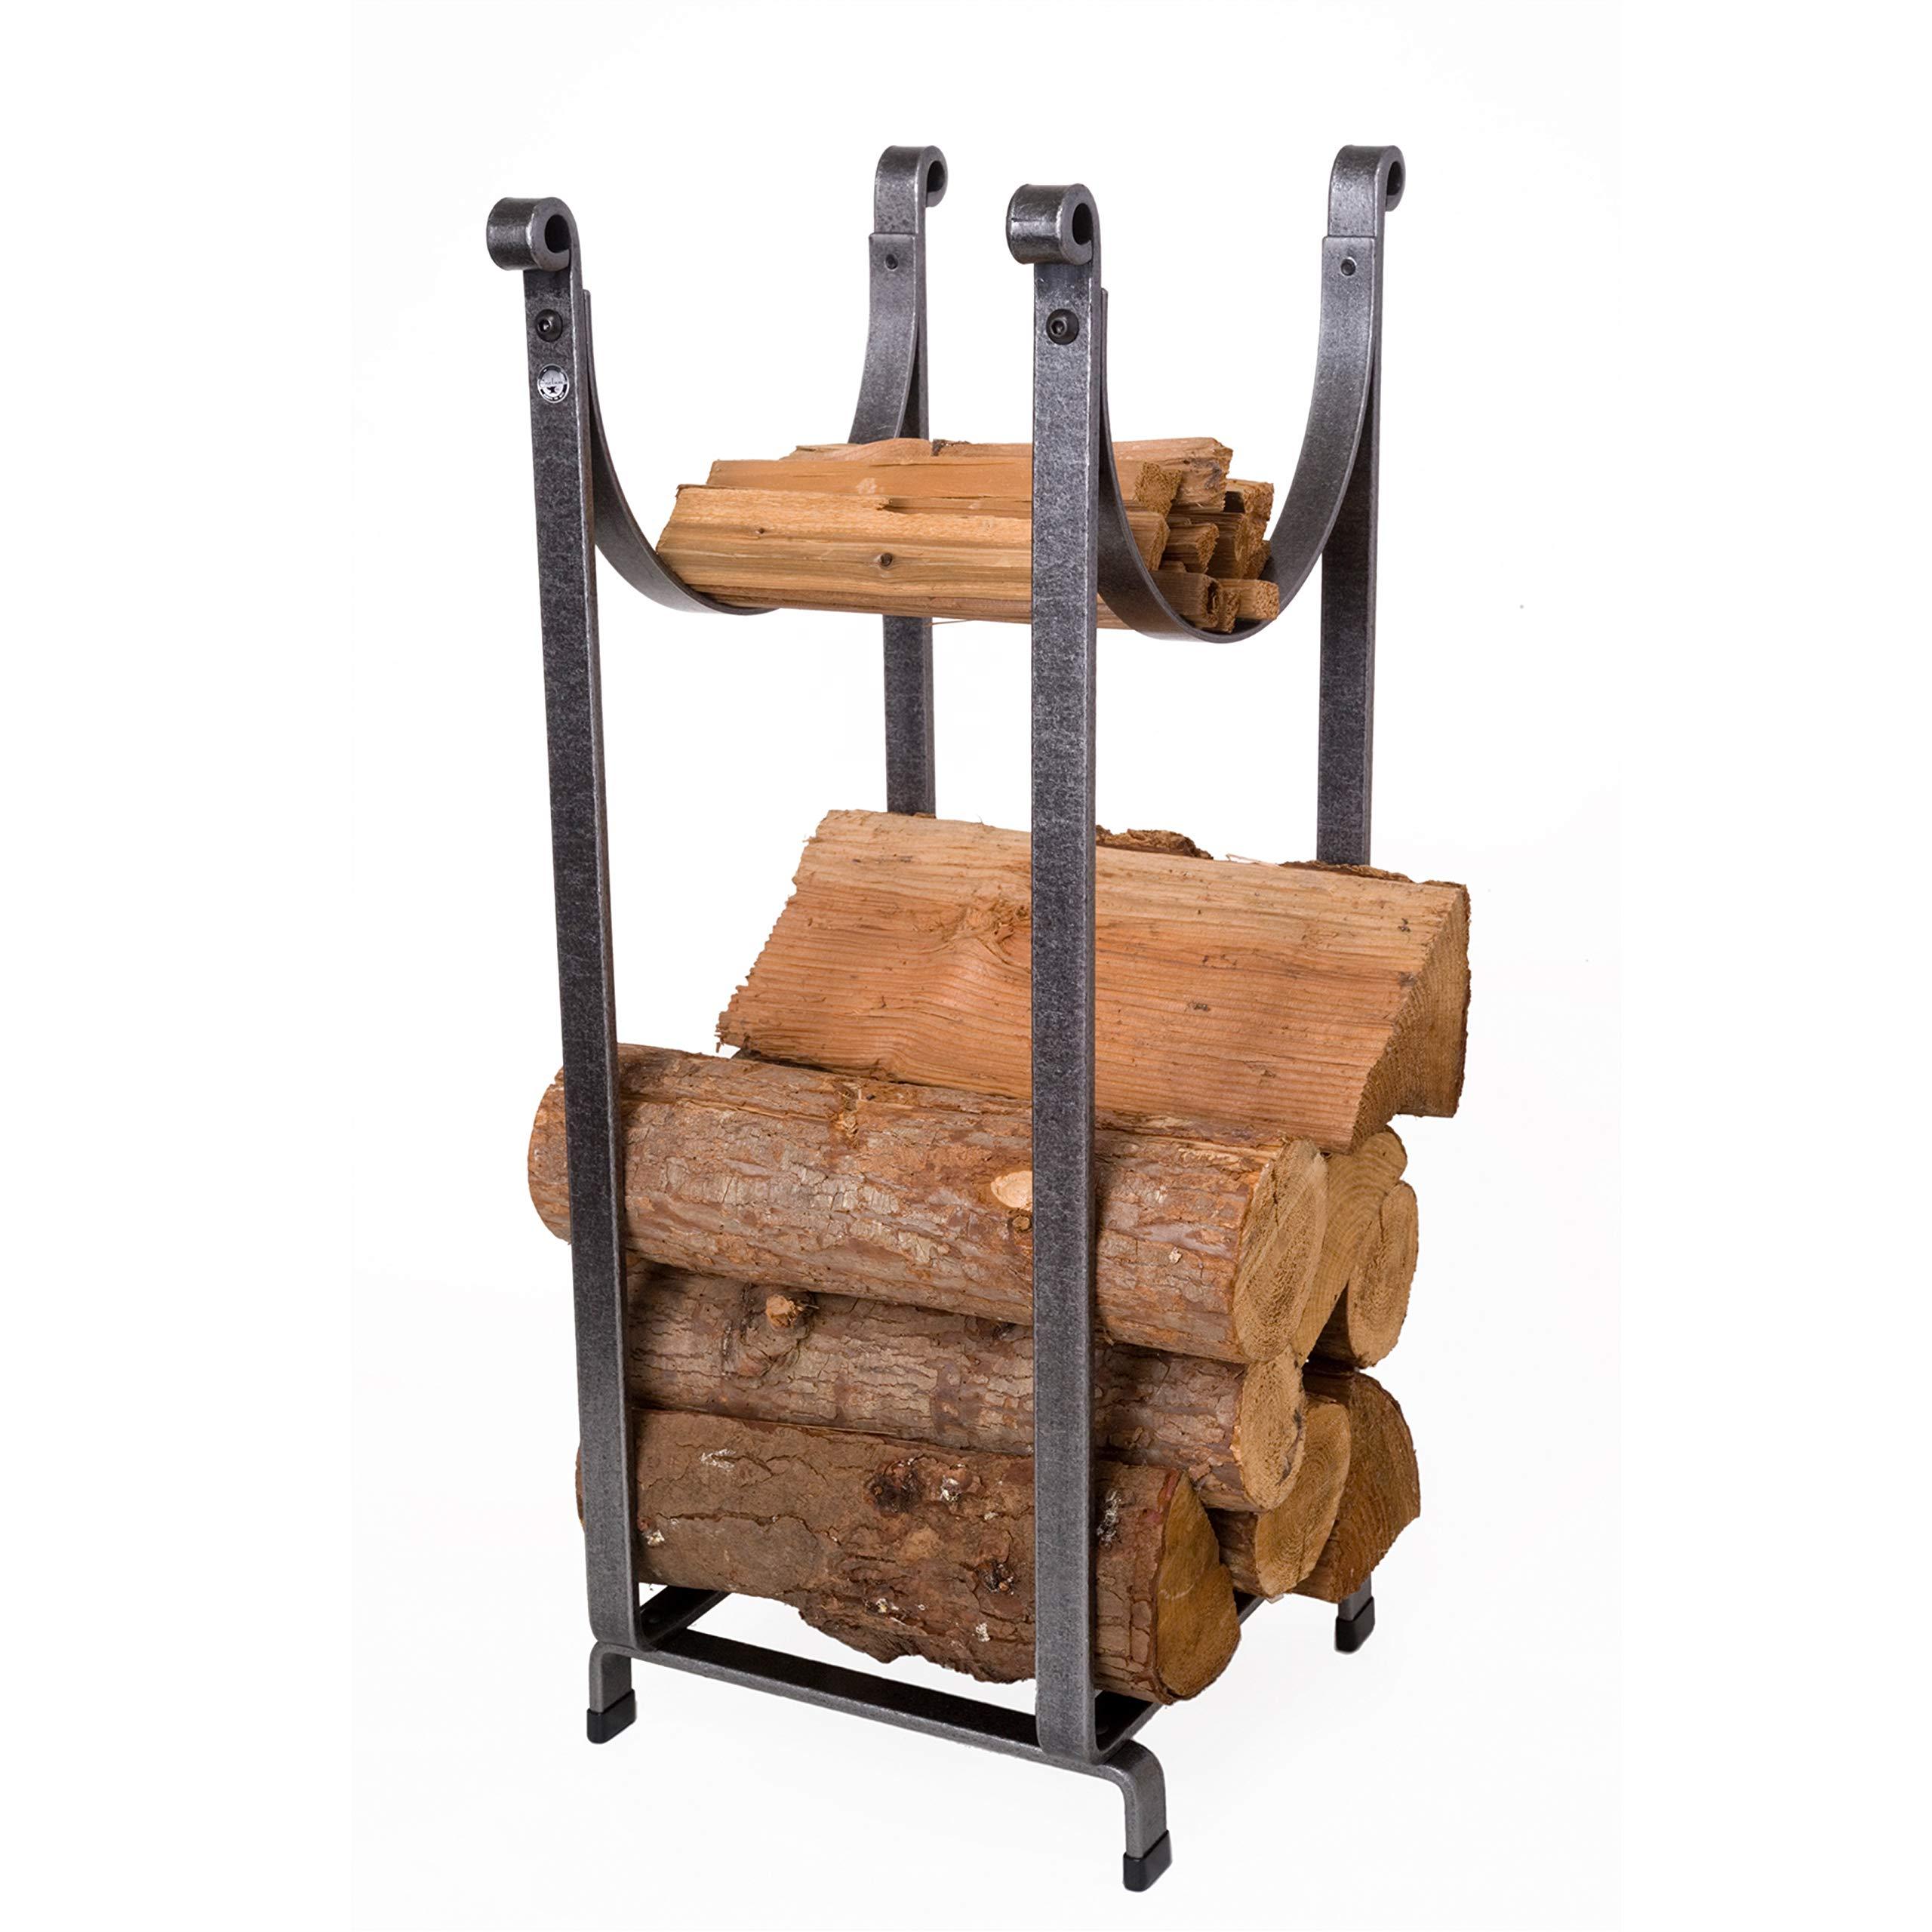 Enclume Sling Log Rack, Hammered Steel by Enclume Hearth